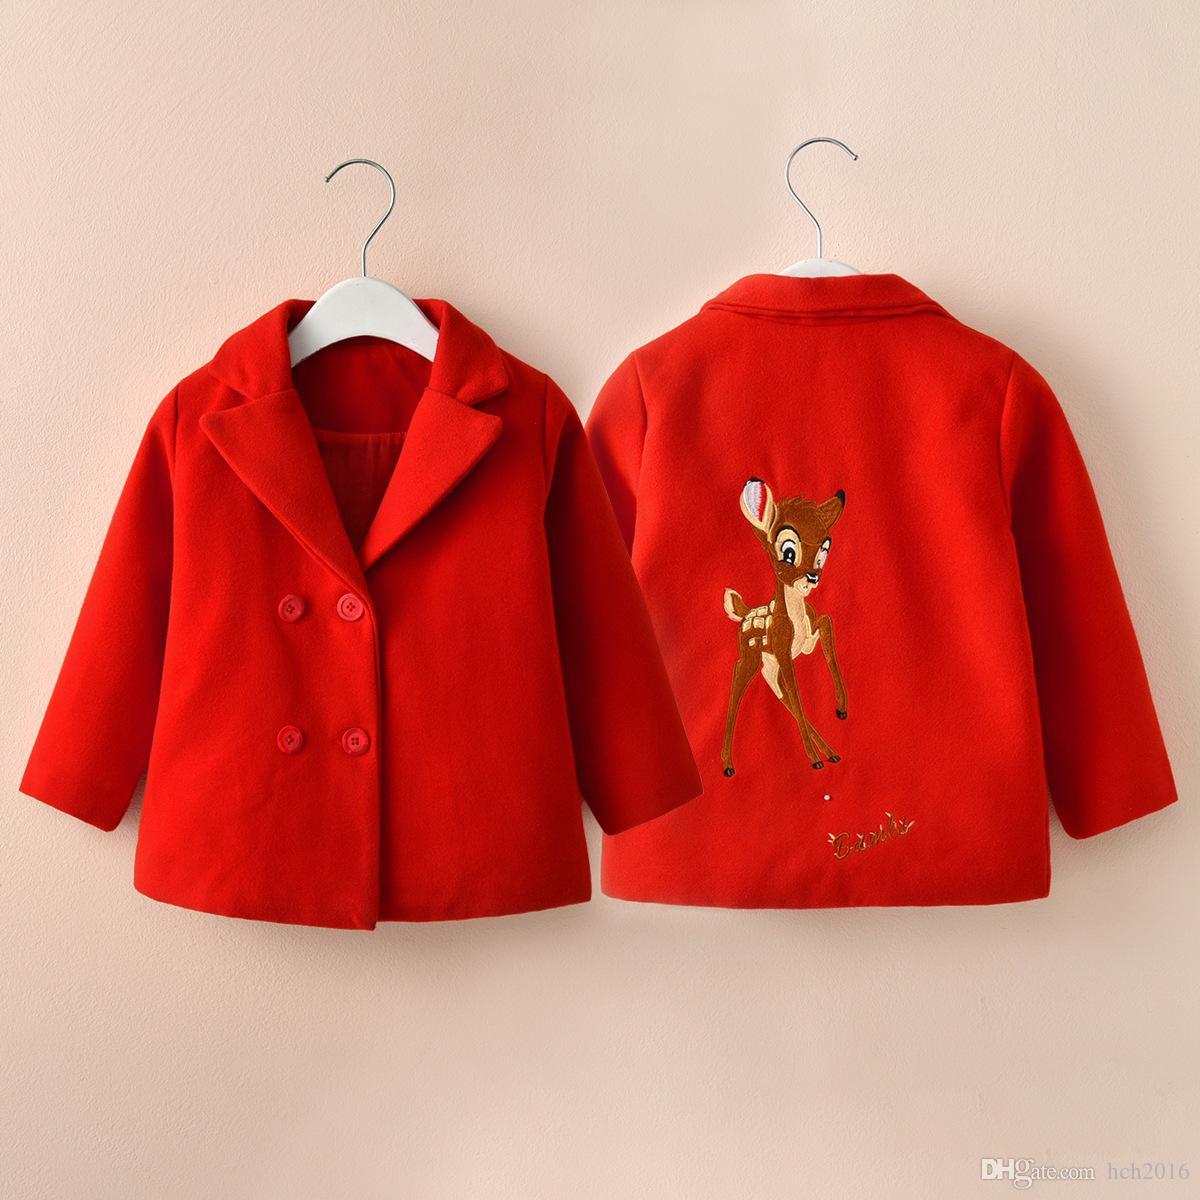 a54a3505b Baby Kids Clothing Outwear Coat 2018 Winter Christmas Girl Full Coats  Caputium Hoodie For Girls Overcoat Jackets Woolen Coat Clothes Teenage  Winter Coats ...